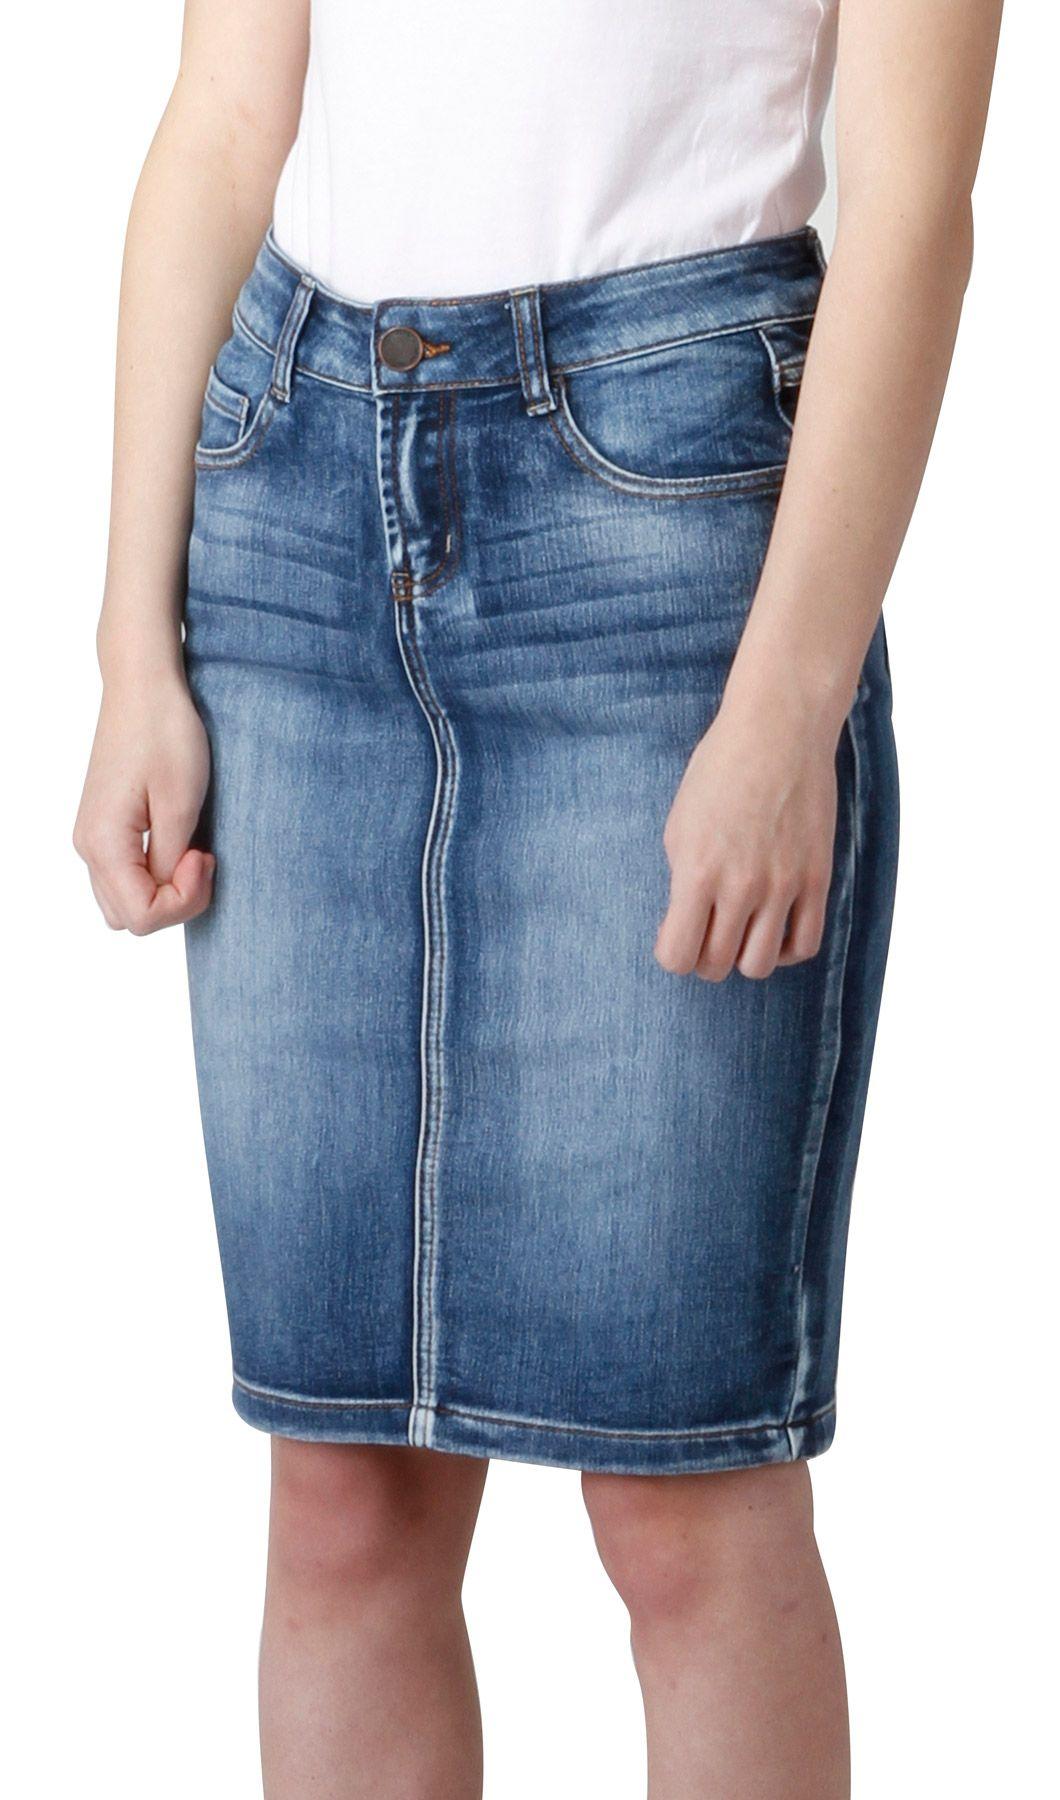 b1683f0c81 Knee Length Vintage Wash Denim Skirt (SKIRT95) | Mid Length Denim Skirts | Denim  Skirts